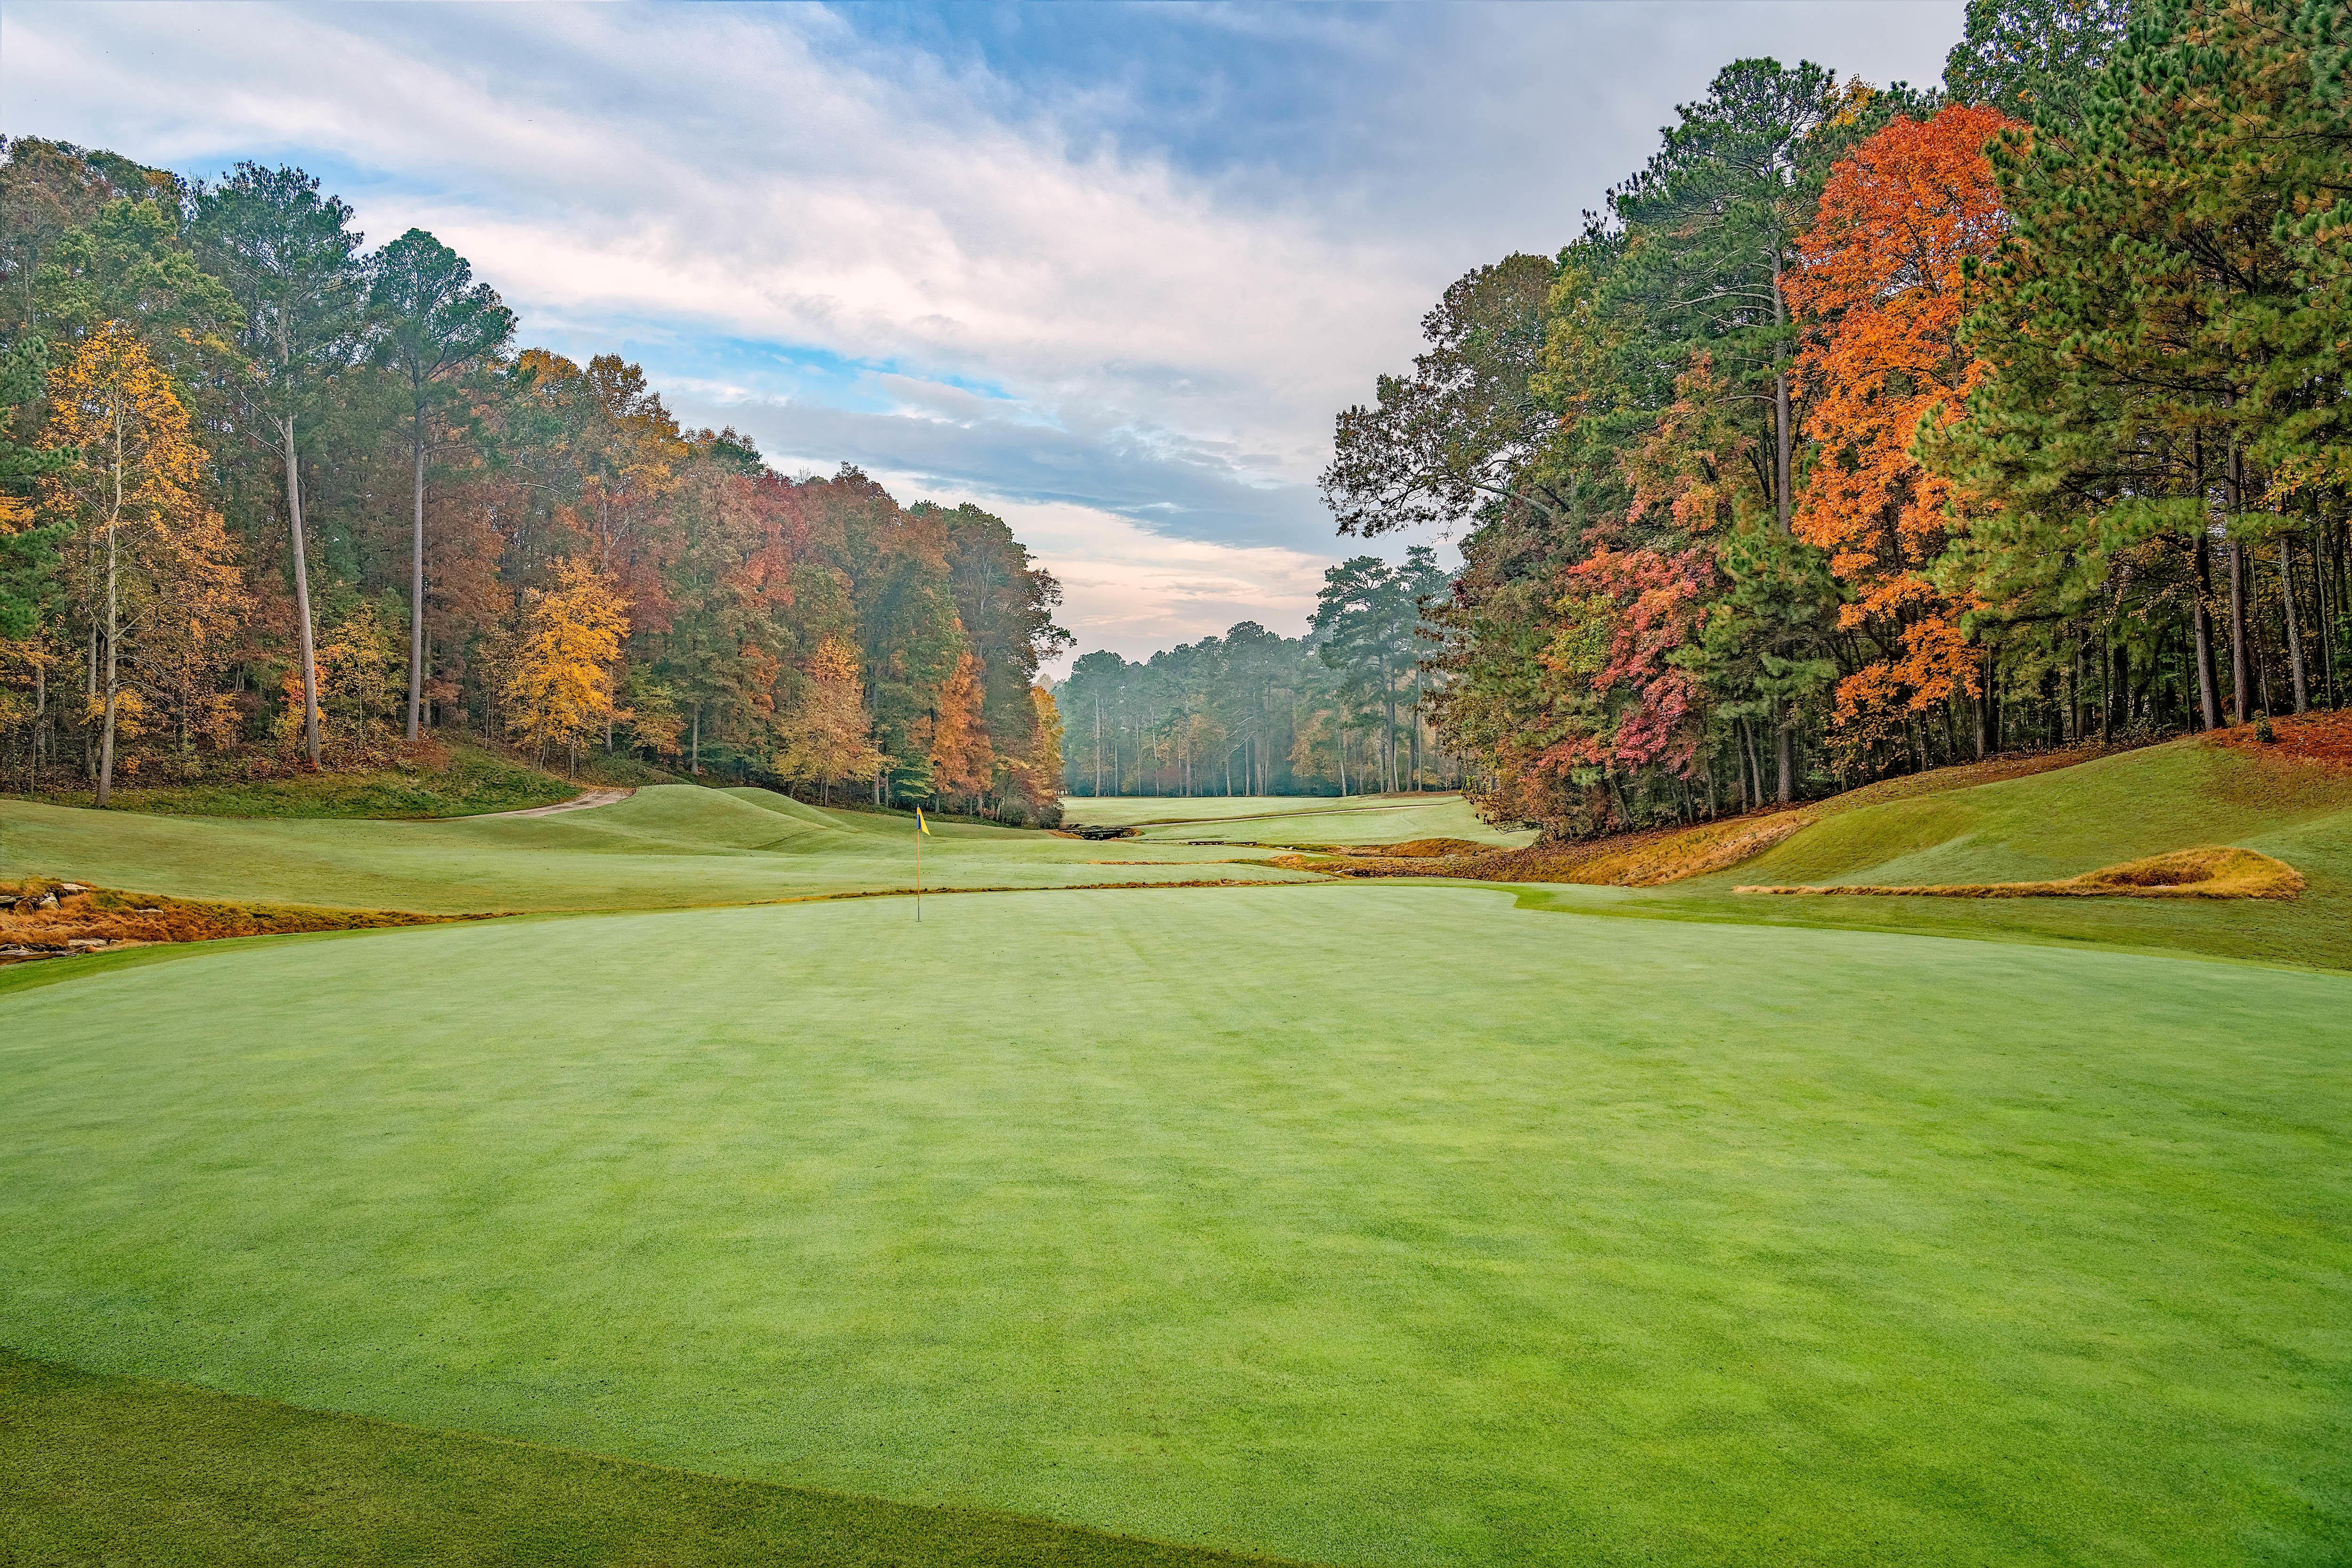 The Golf Club of Georgia image 5